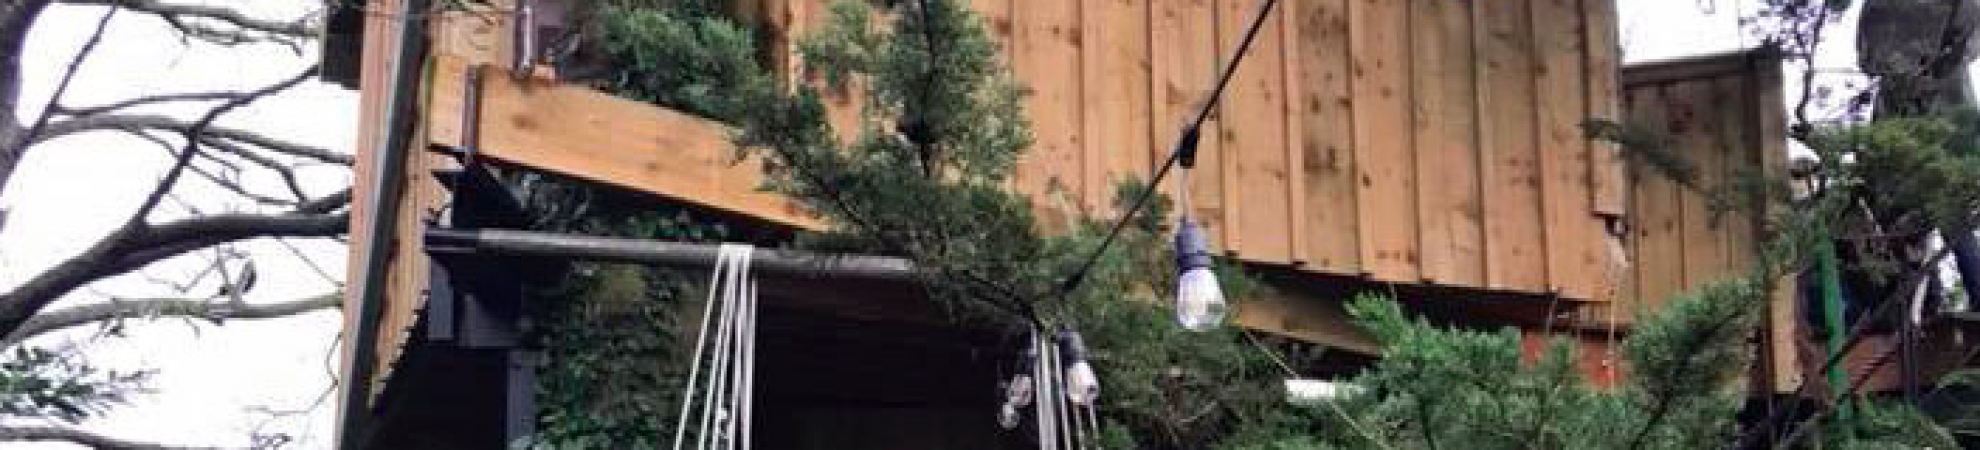 Tranquilla Tree Airbnb